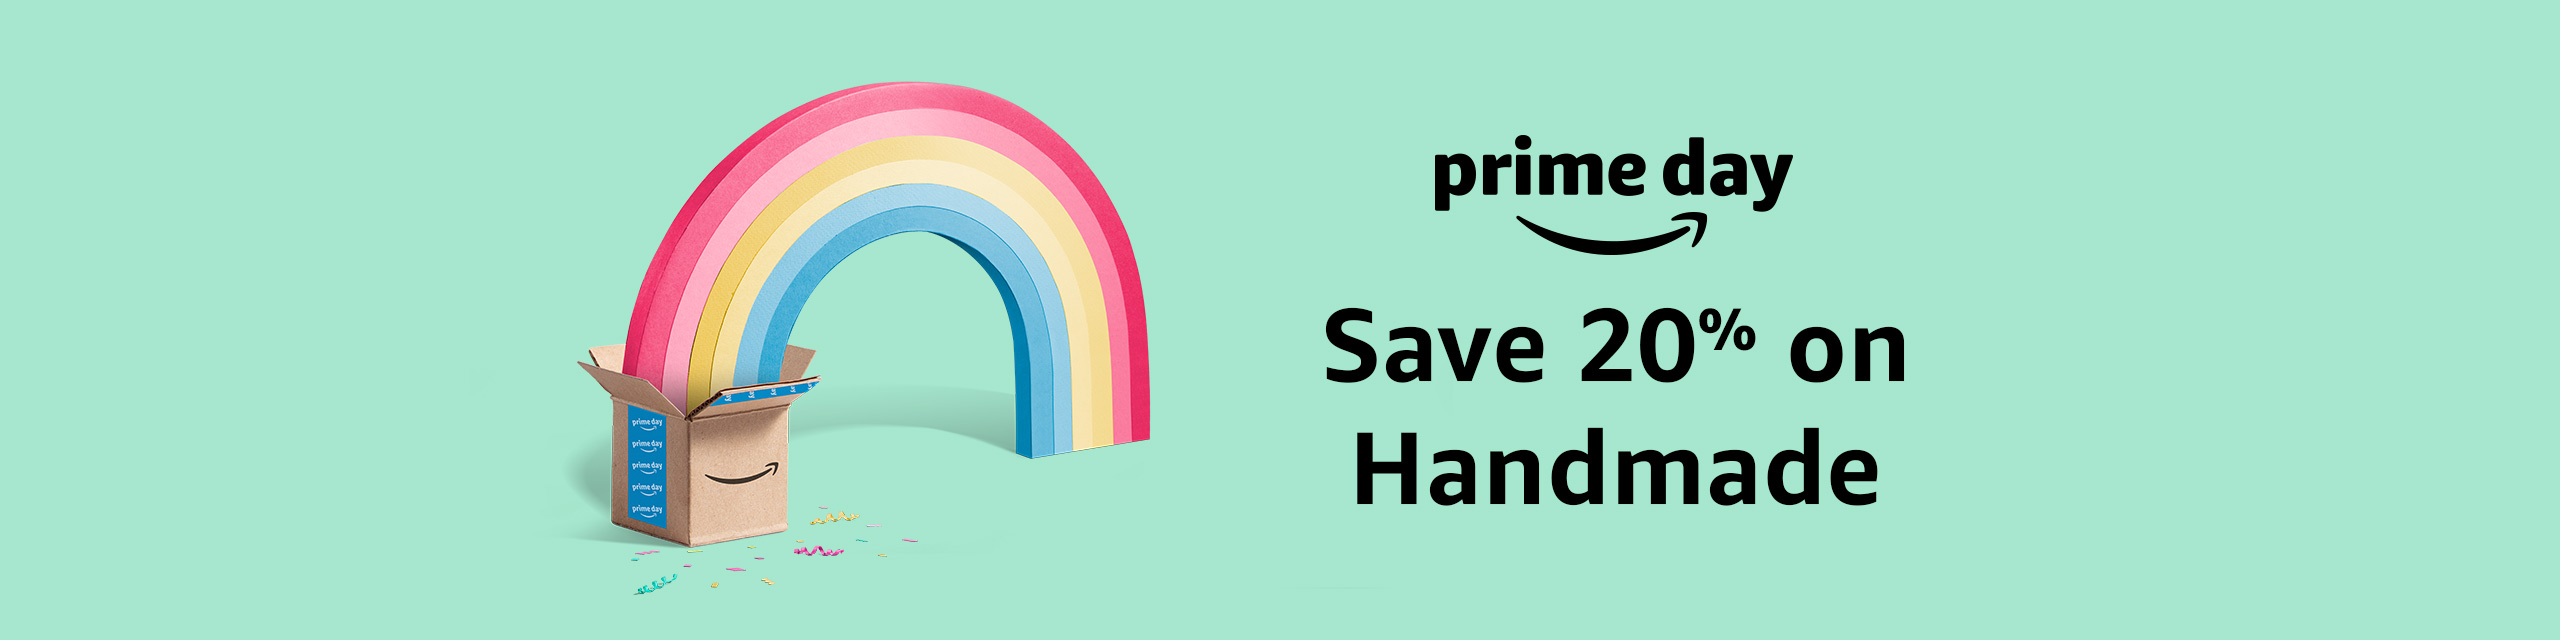 Prime Day 2018 | Save on Amazon Handmade